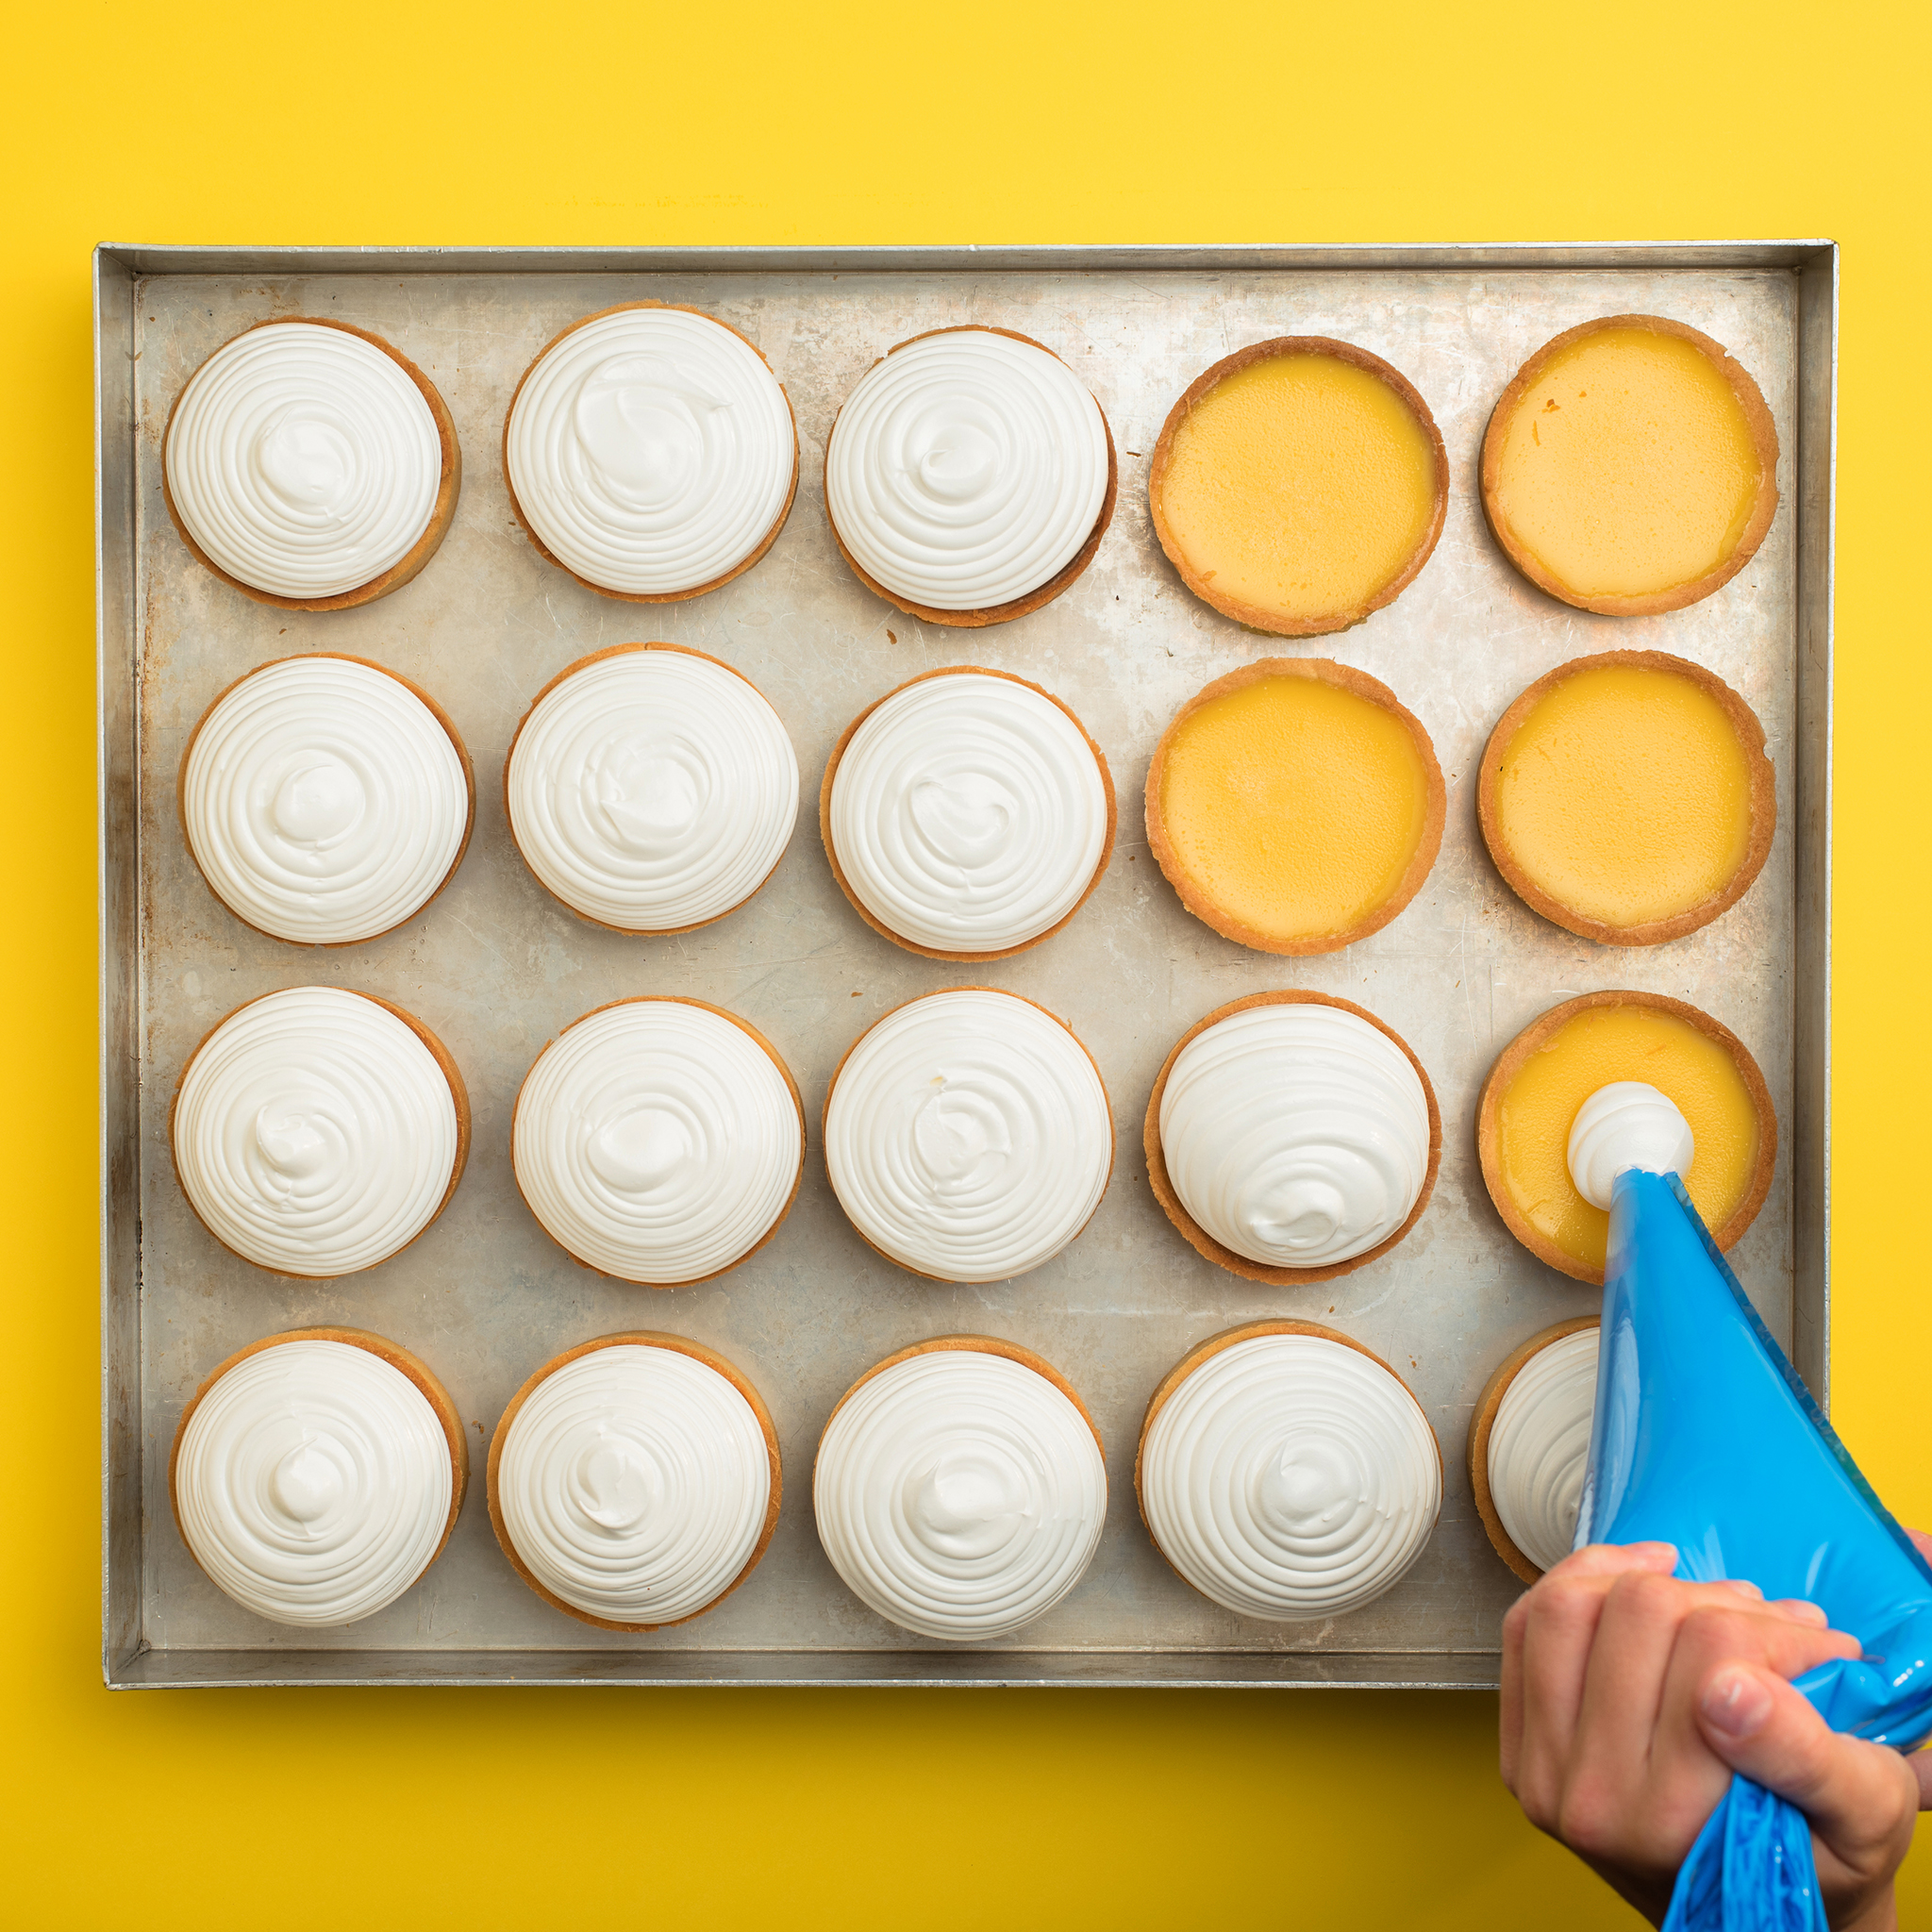 IG_The Pudding Stop_Lemon Meringue Pie_Series.jpg